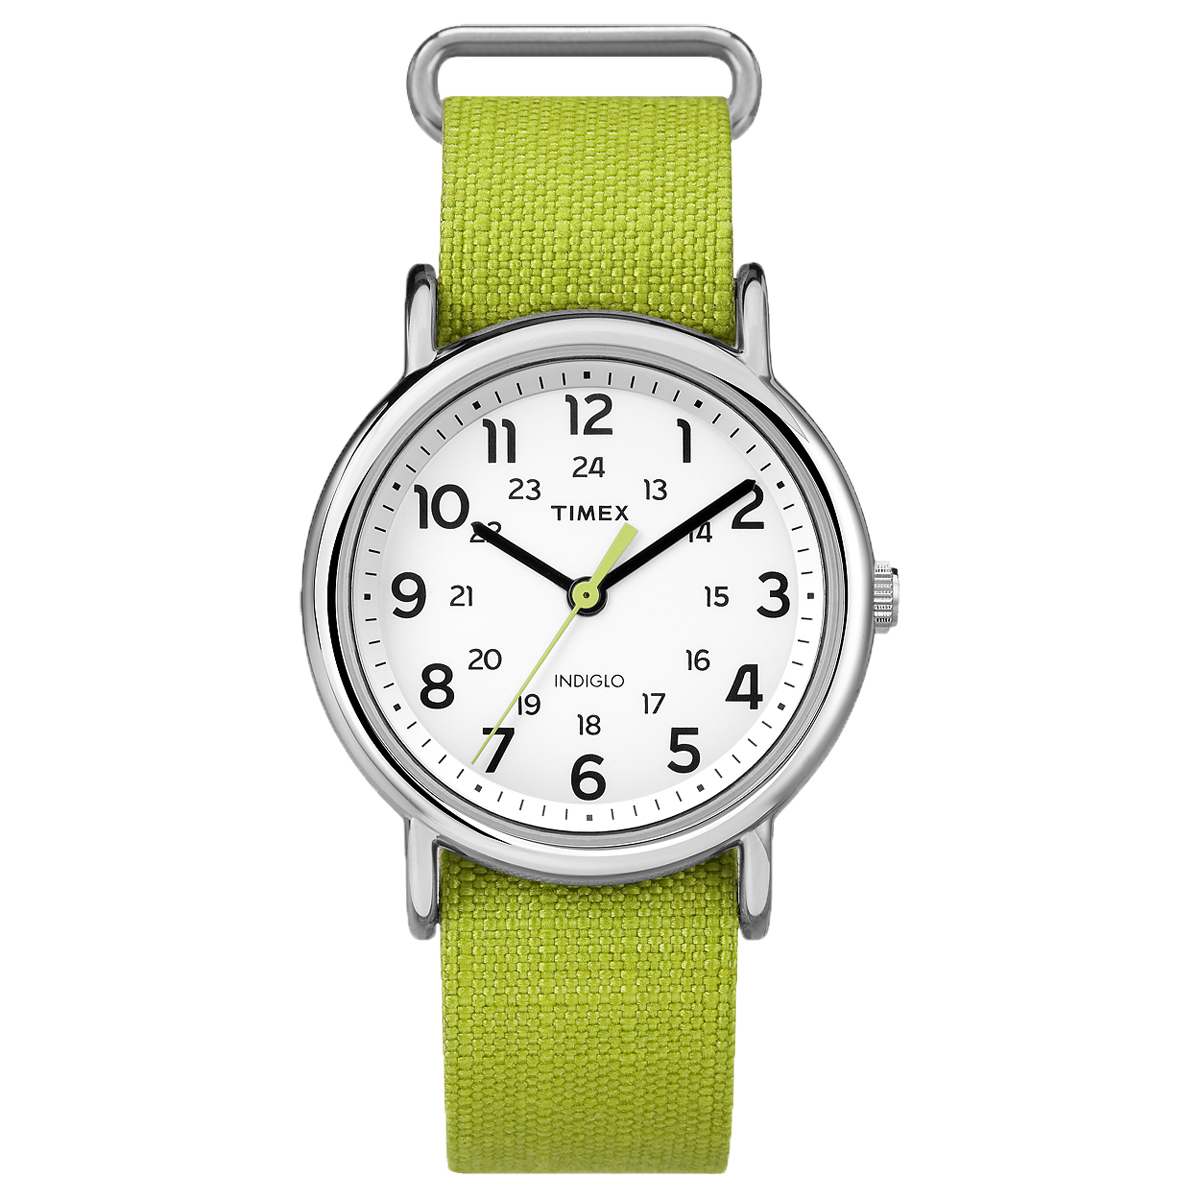 Timex Weekender Rip-Stop Water Resistant Analog Watch w  Slip-Thru Strap by Timex